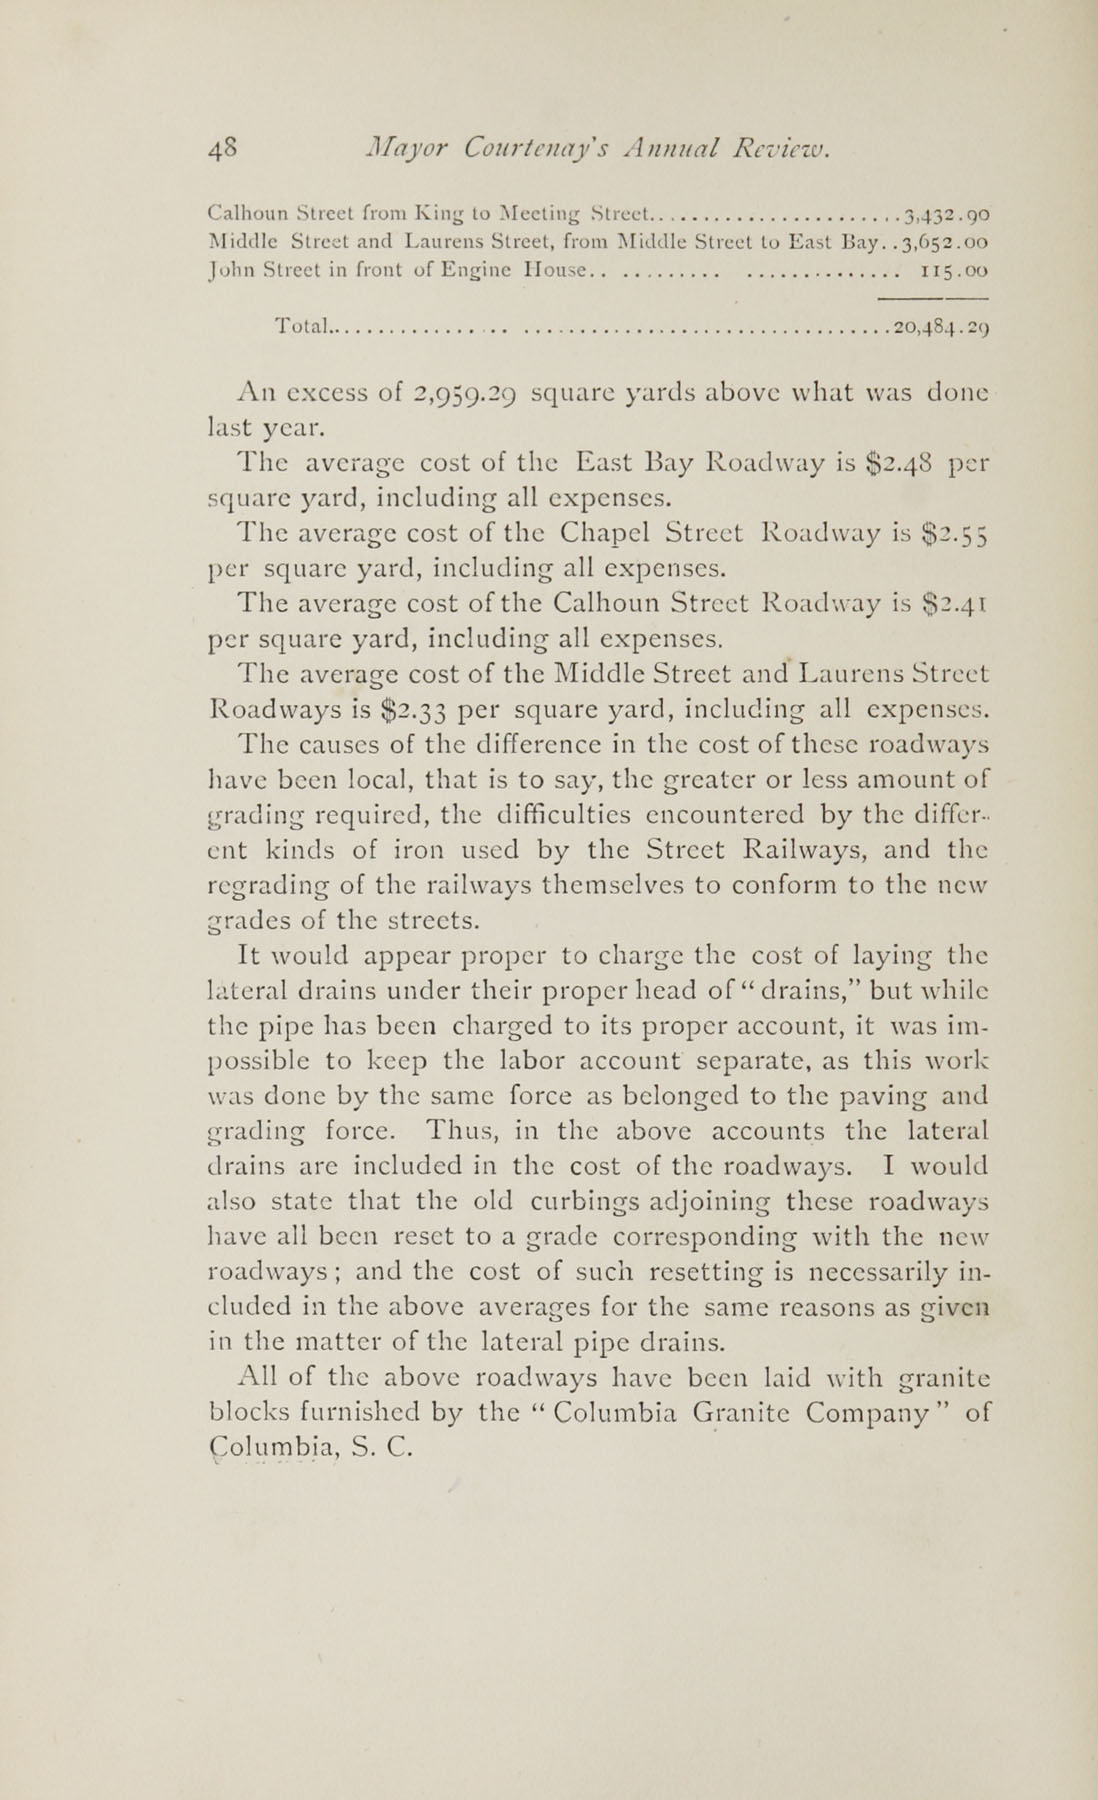 Charleston Yearbook, 1882, page 48